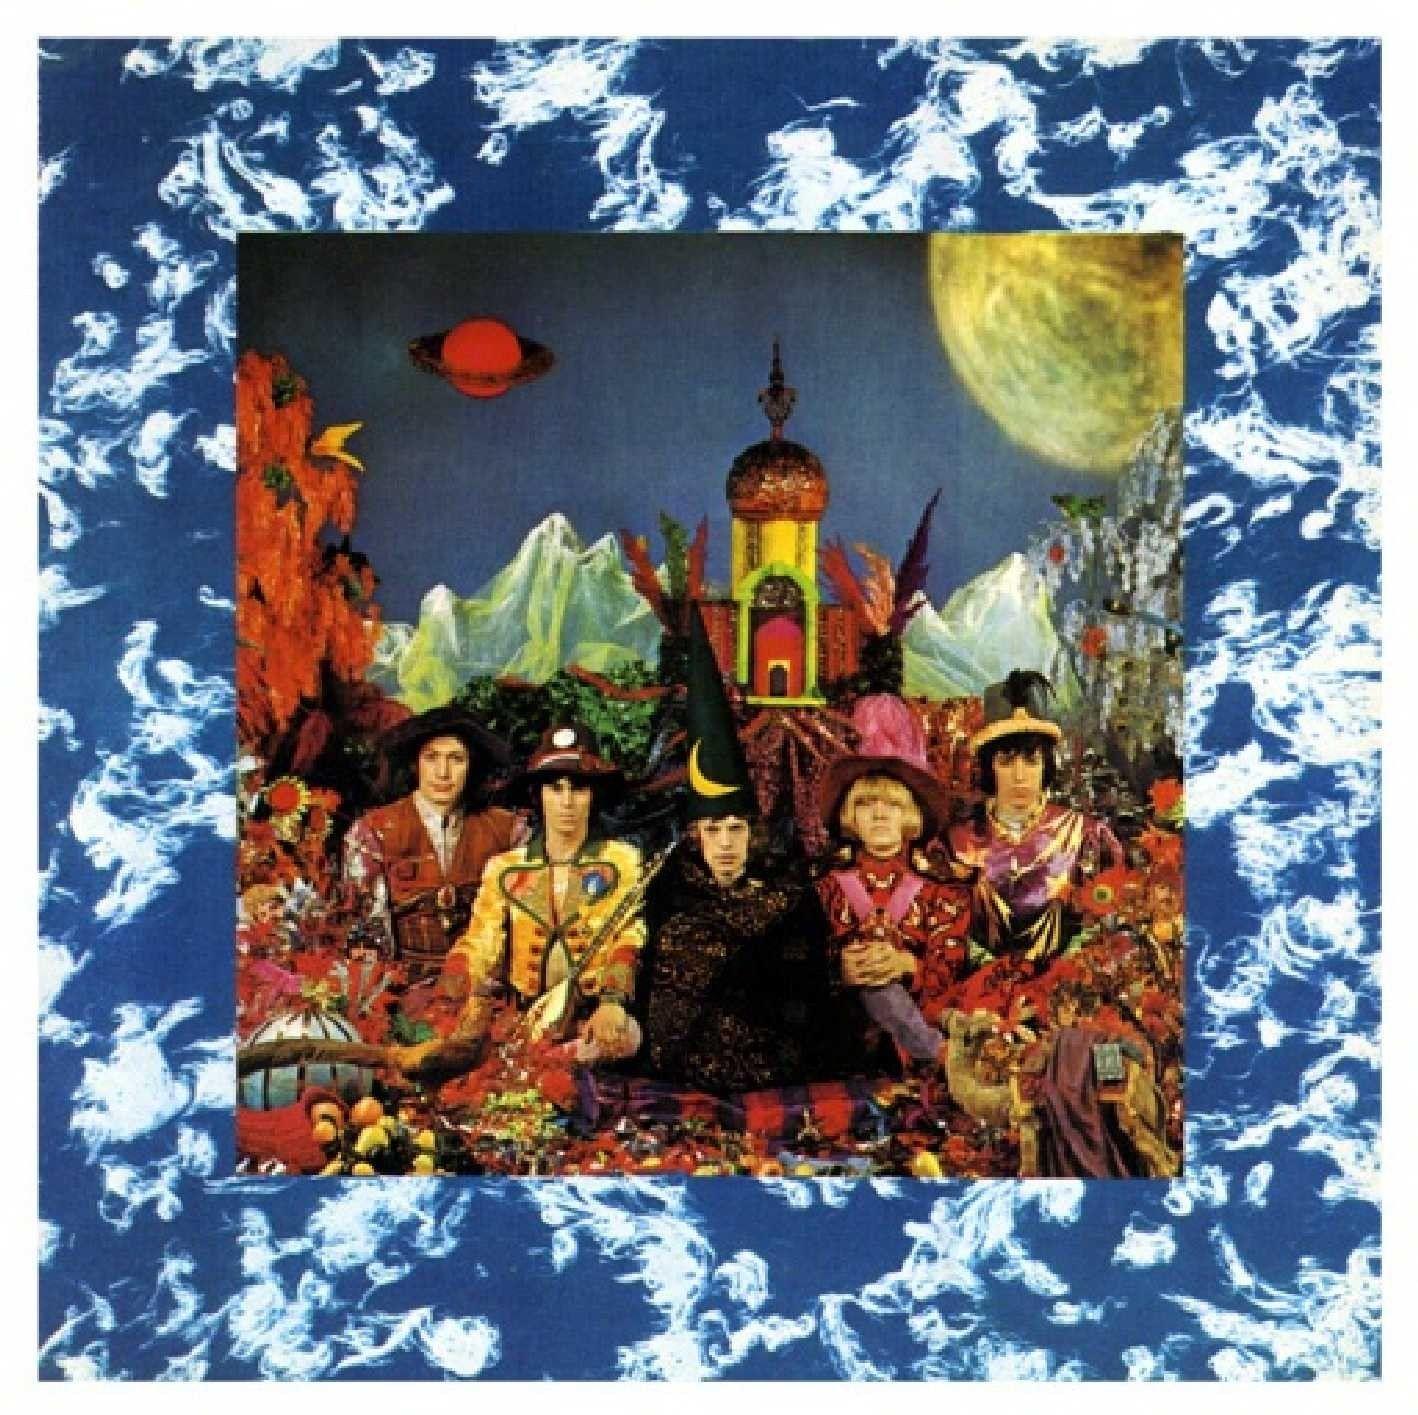 Artist The Rolling Stones Album Their Satanic Majesties